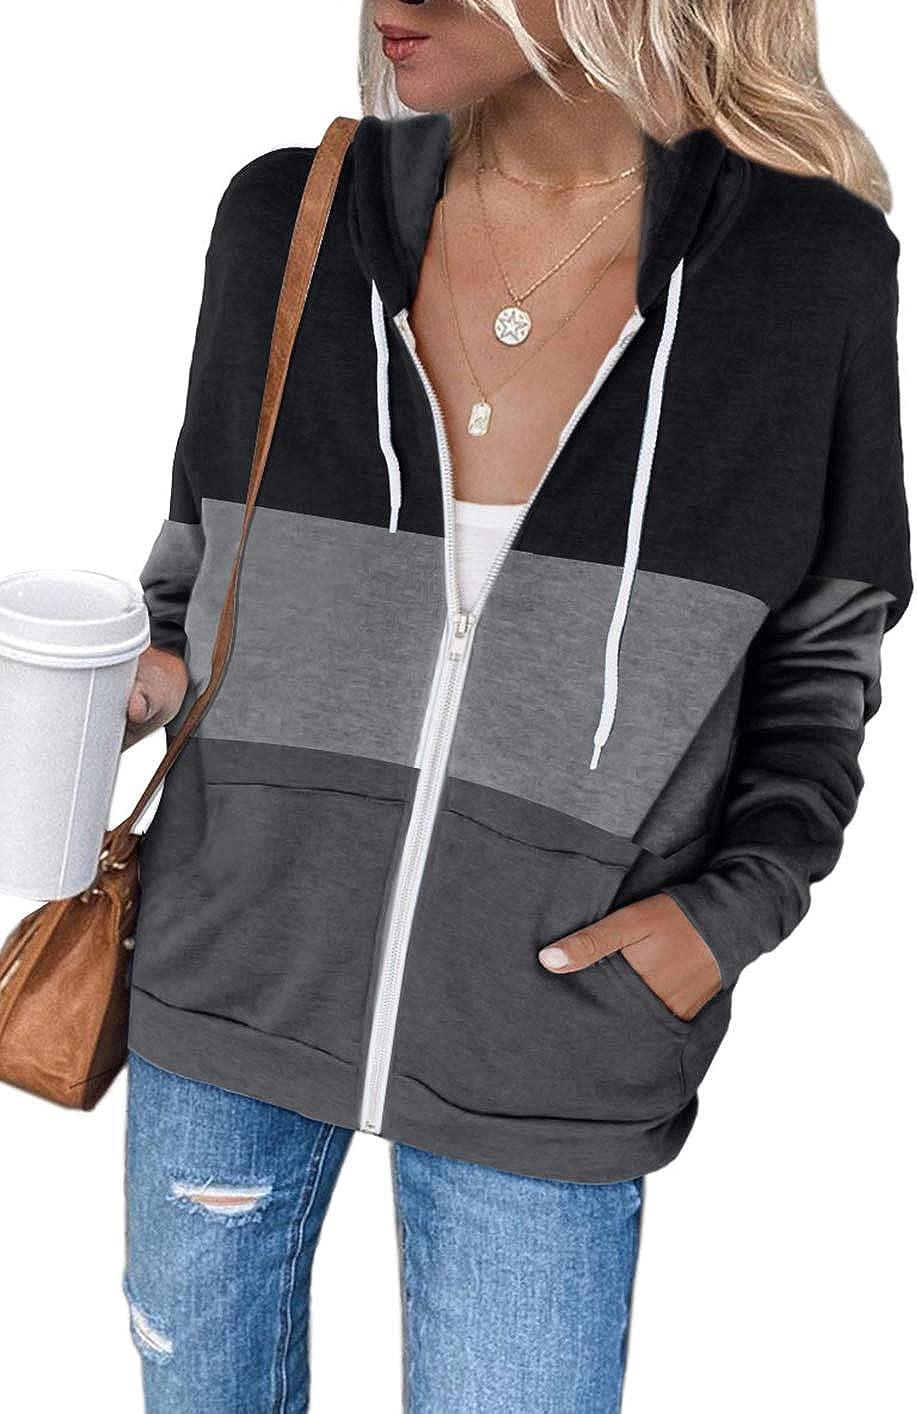 Shawhuwa Womens Long Sleeve Hooded Sweatshirt Hoodies Zip Up Track Jacket with Pockets